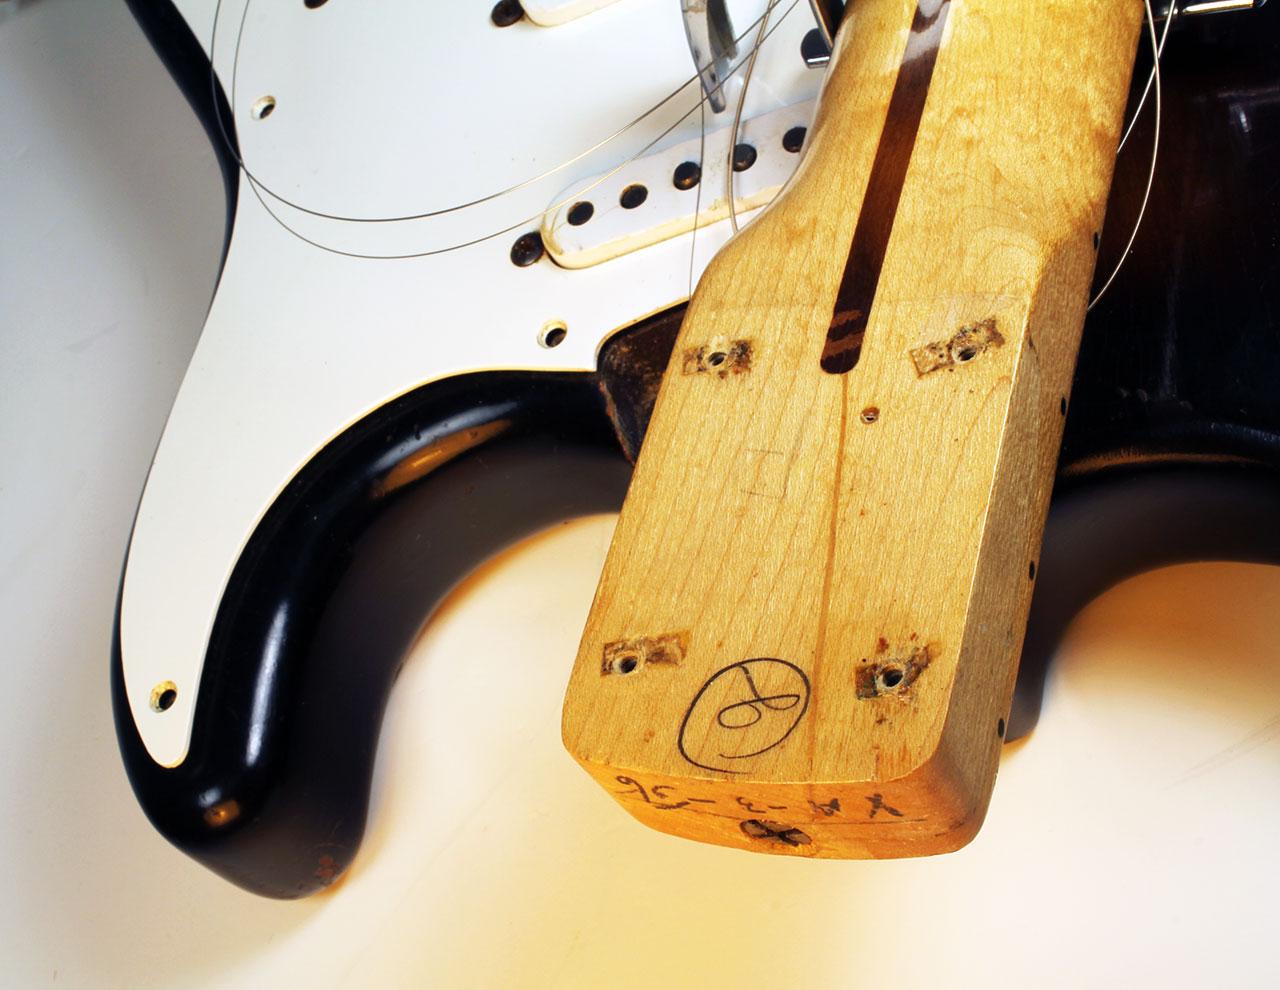 Fender_strat_1956_cons_neck_initial_1